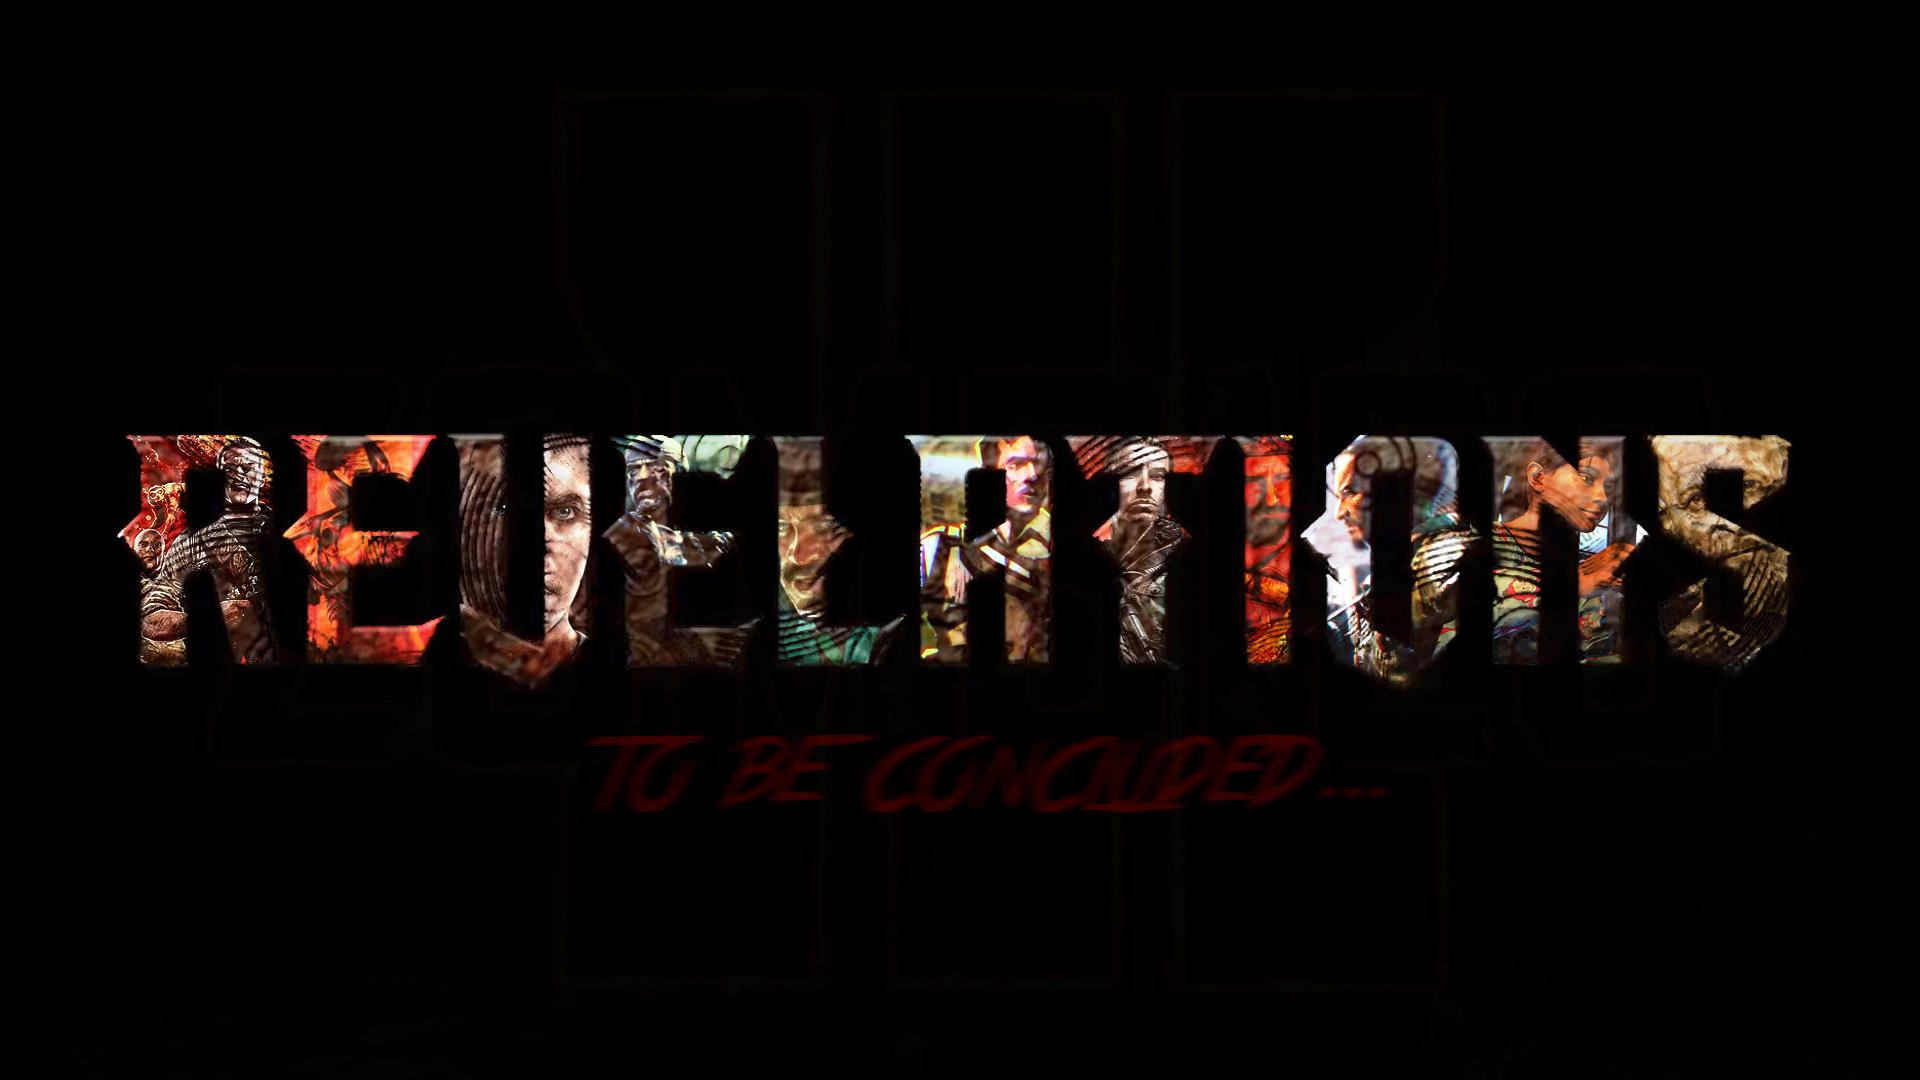 47 Black Ops 3 Revelations 1080p Wallpapers - Album on Imgur